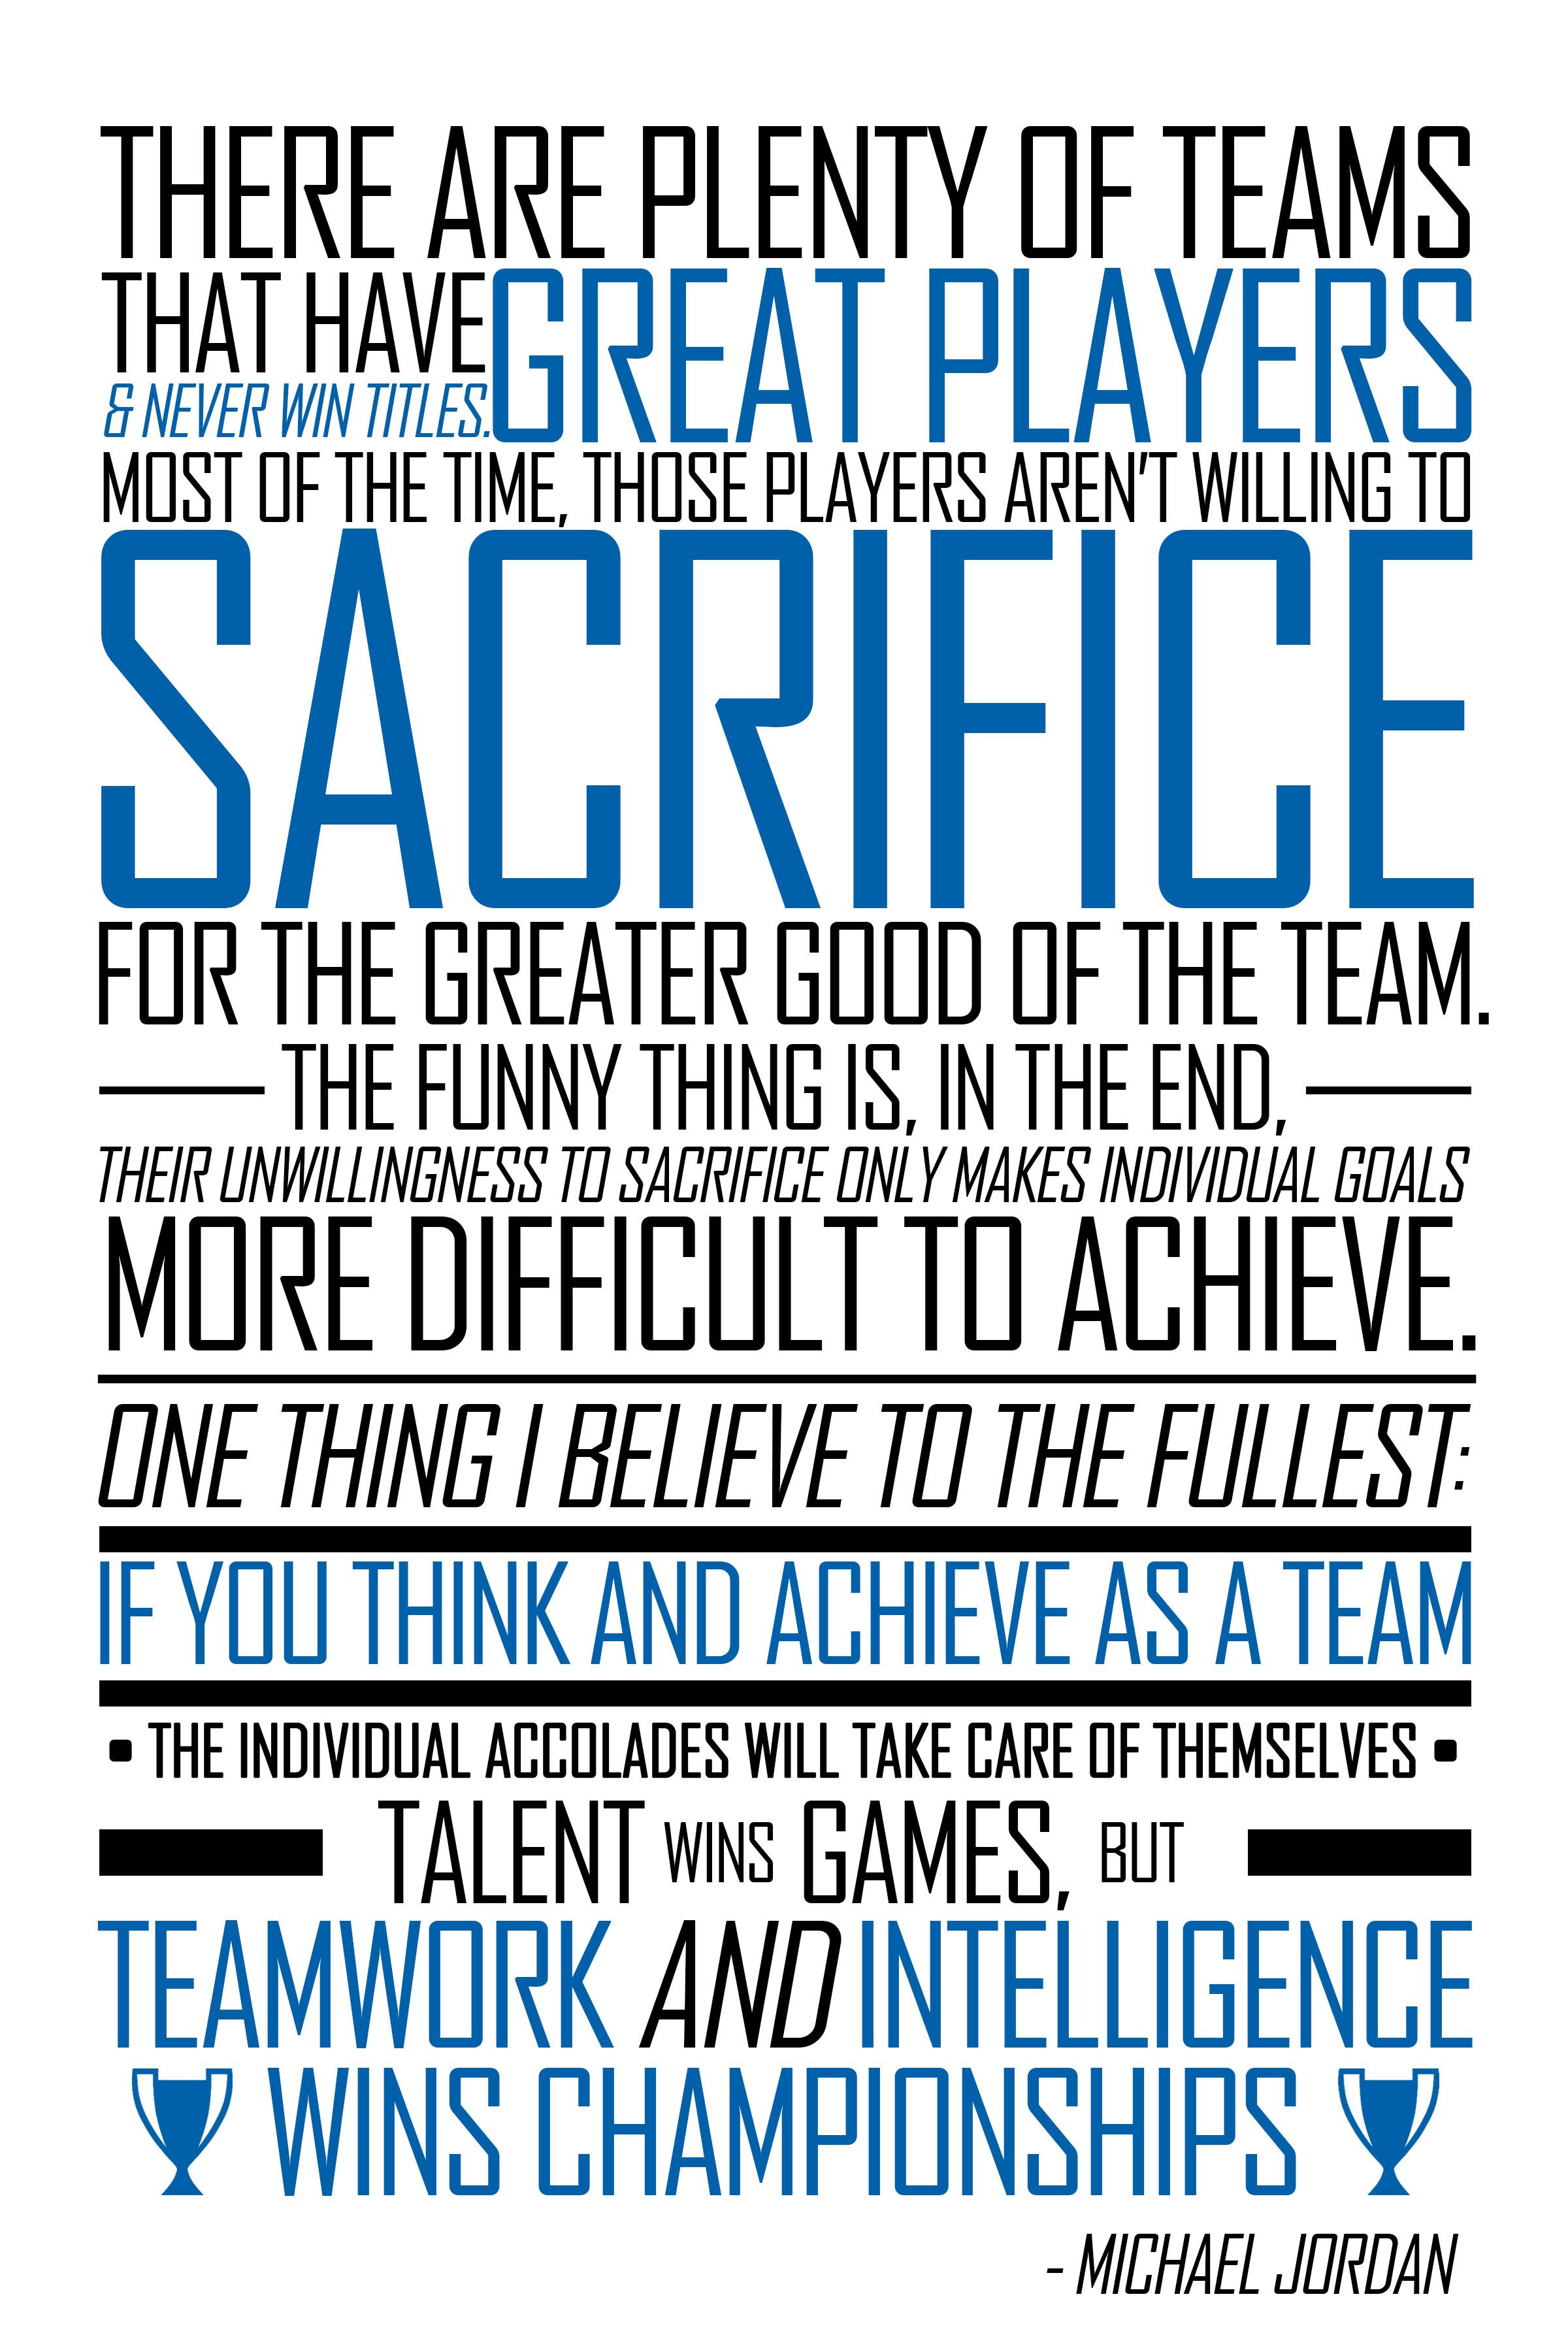 Teamwork Quotes Motivational Sports: Michael Jordan Quotes On Teamwork. QuotesGram